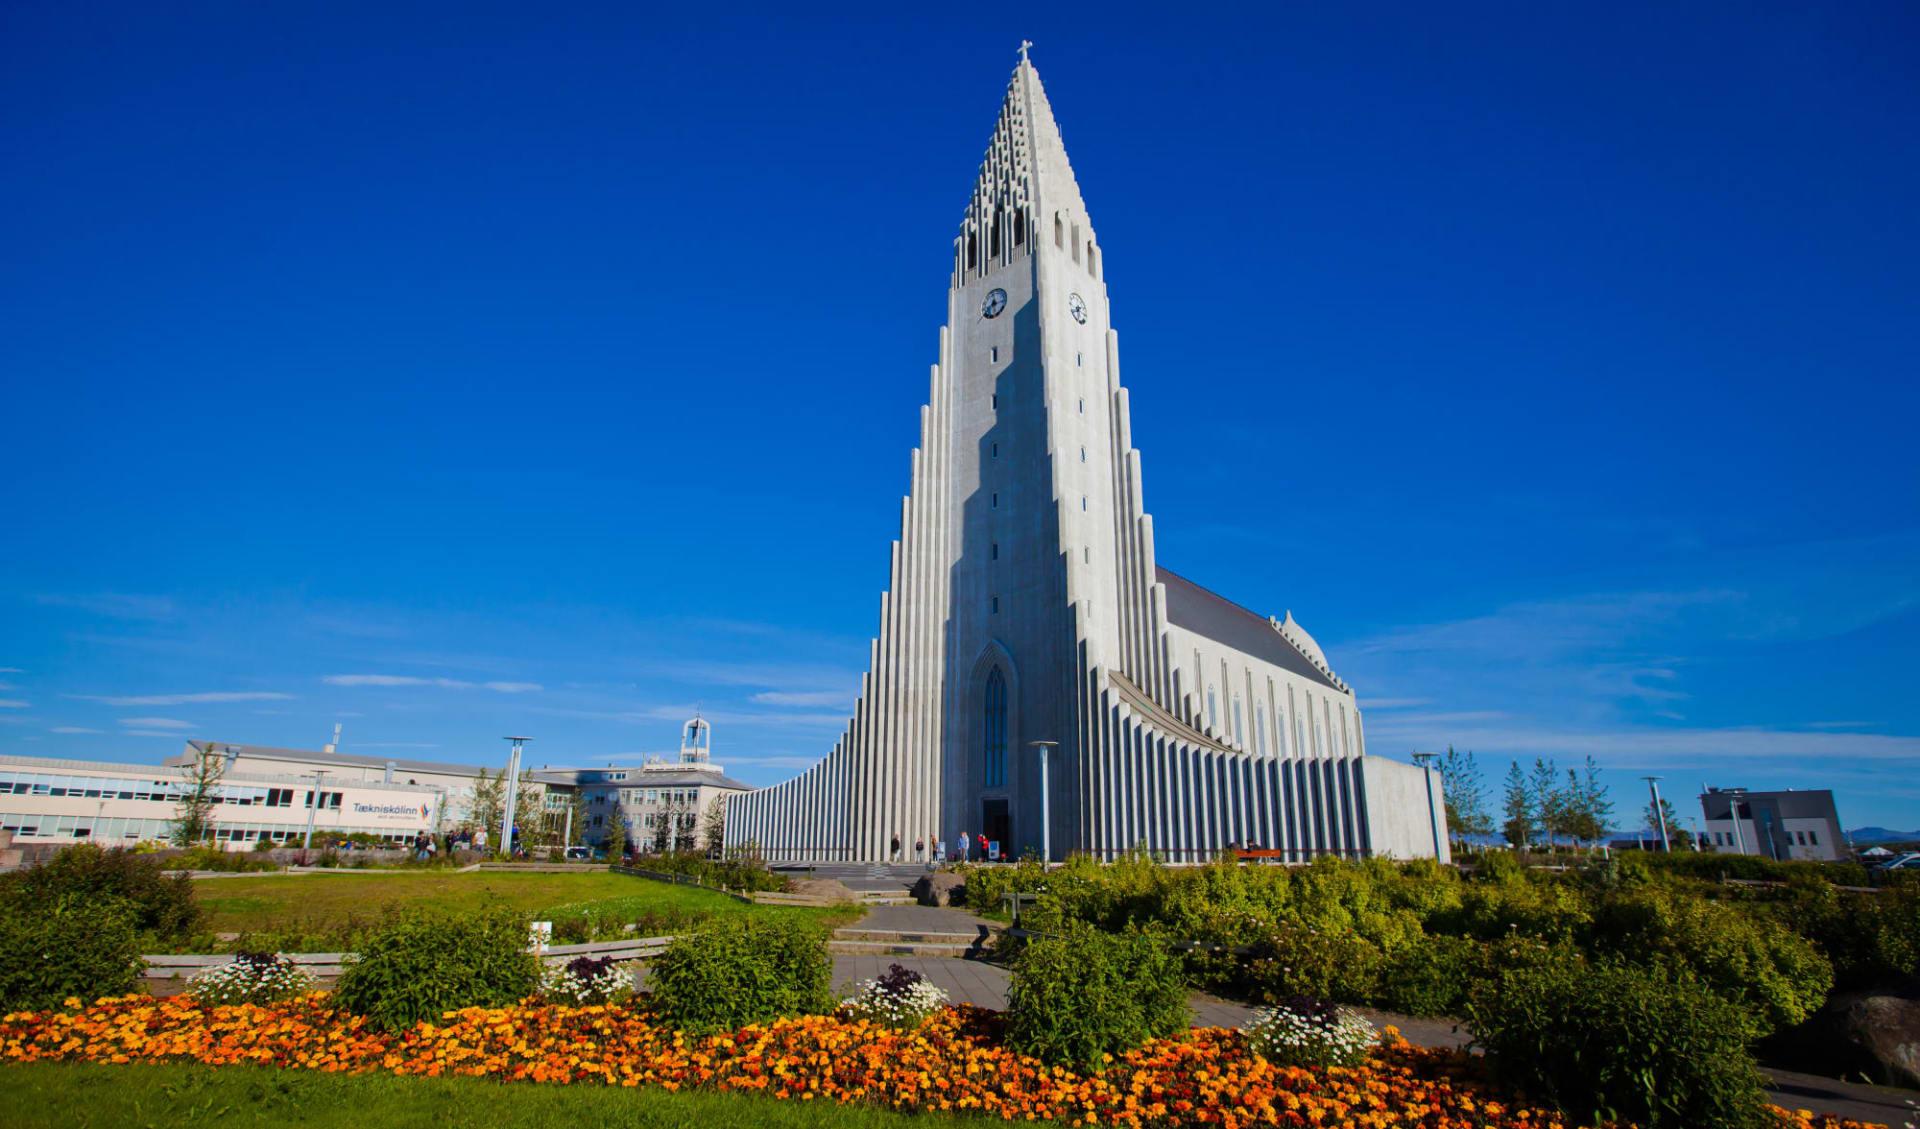 Kea Skuggi in Reykjavik: Beautiful super wide-angle aerial view of Reykjavik